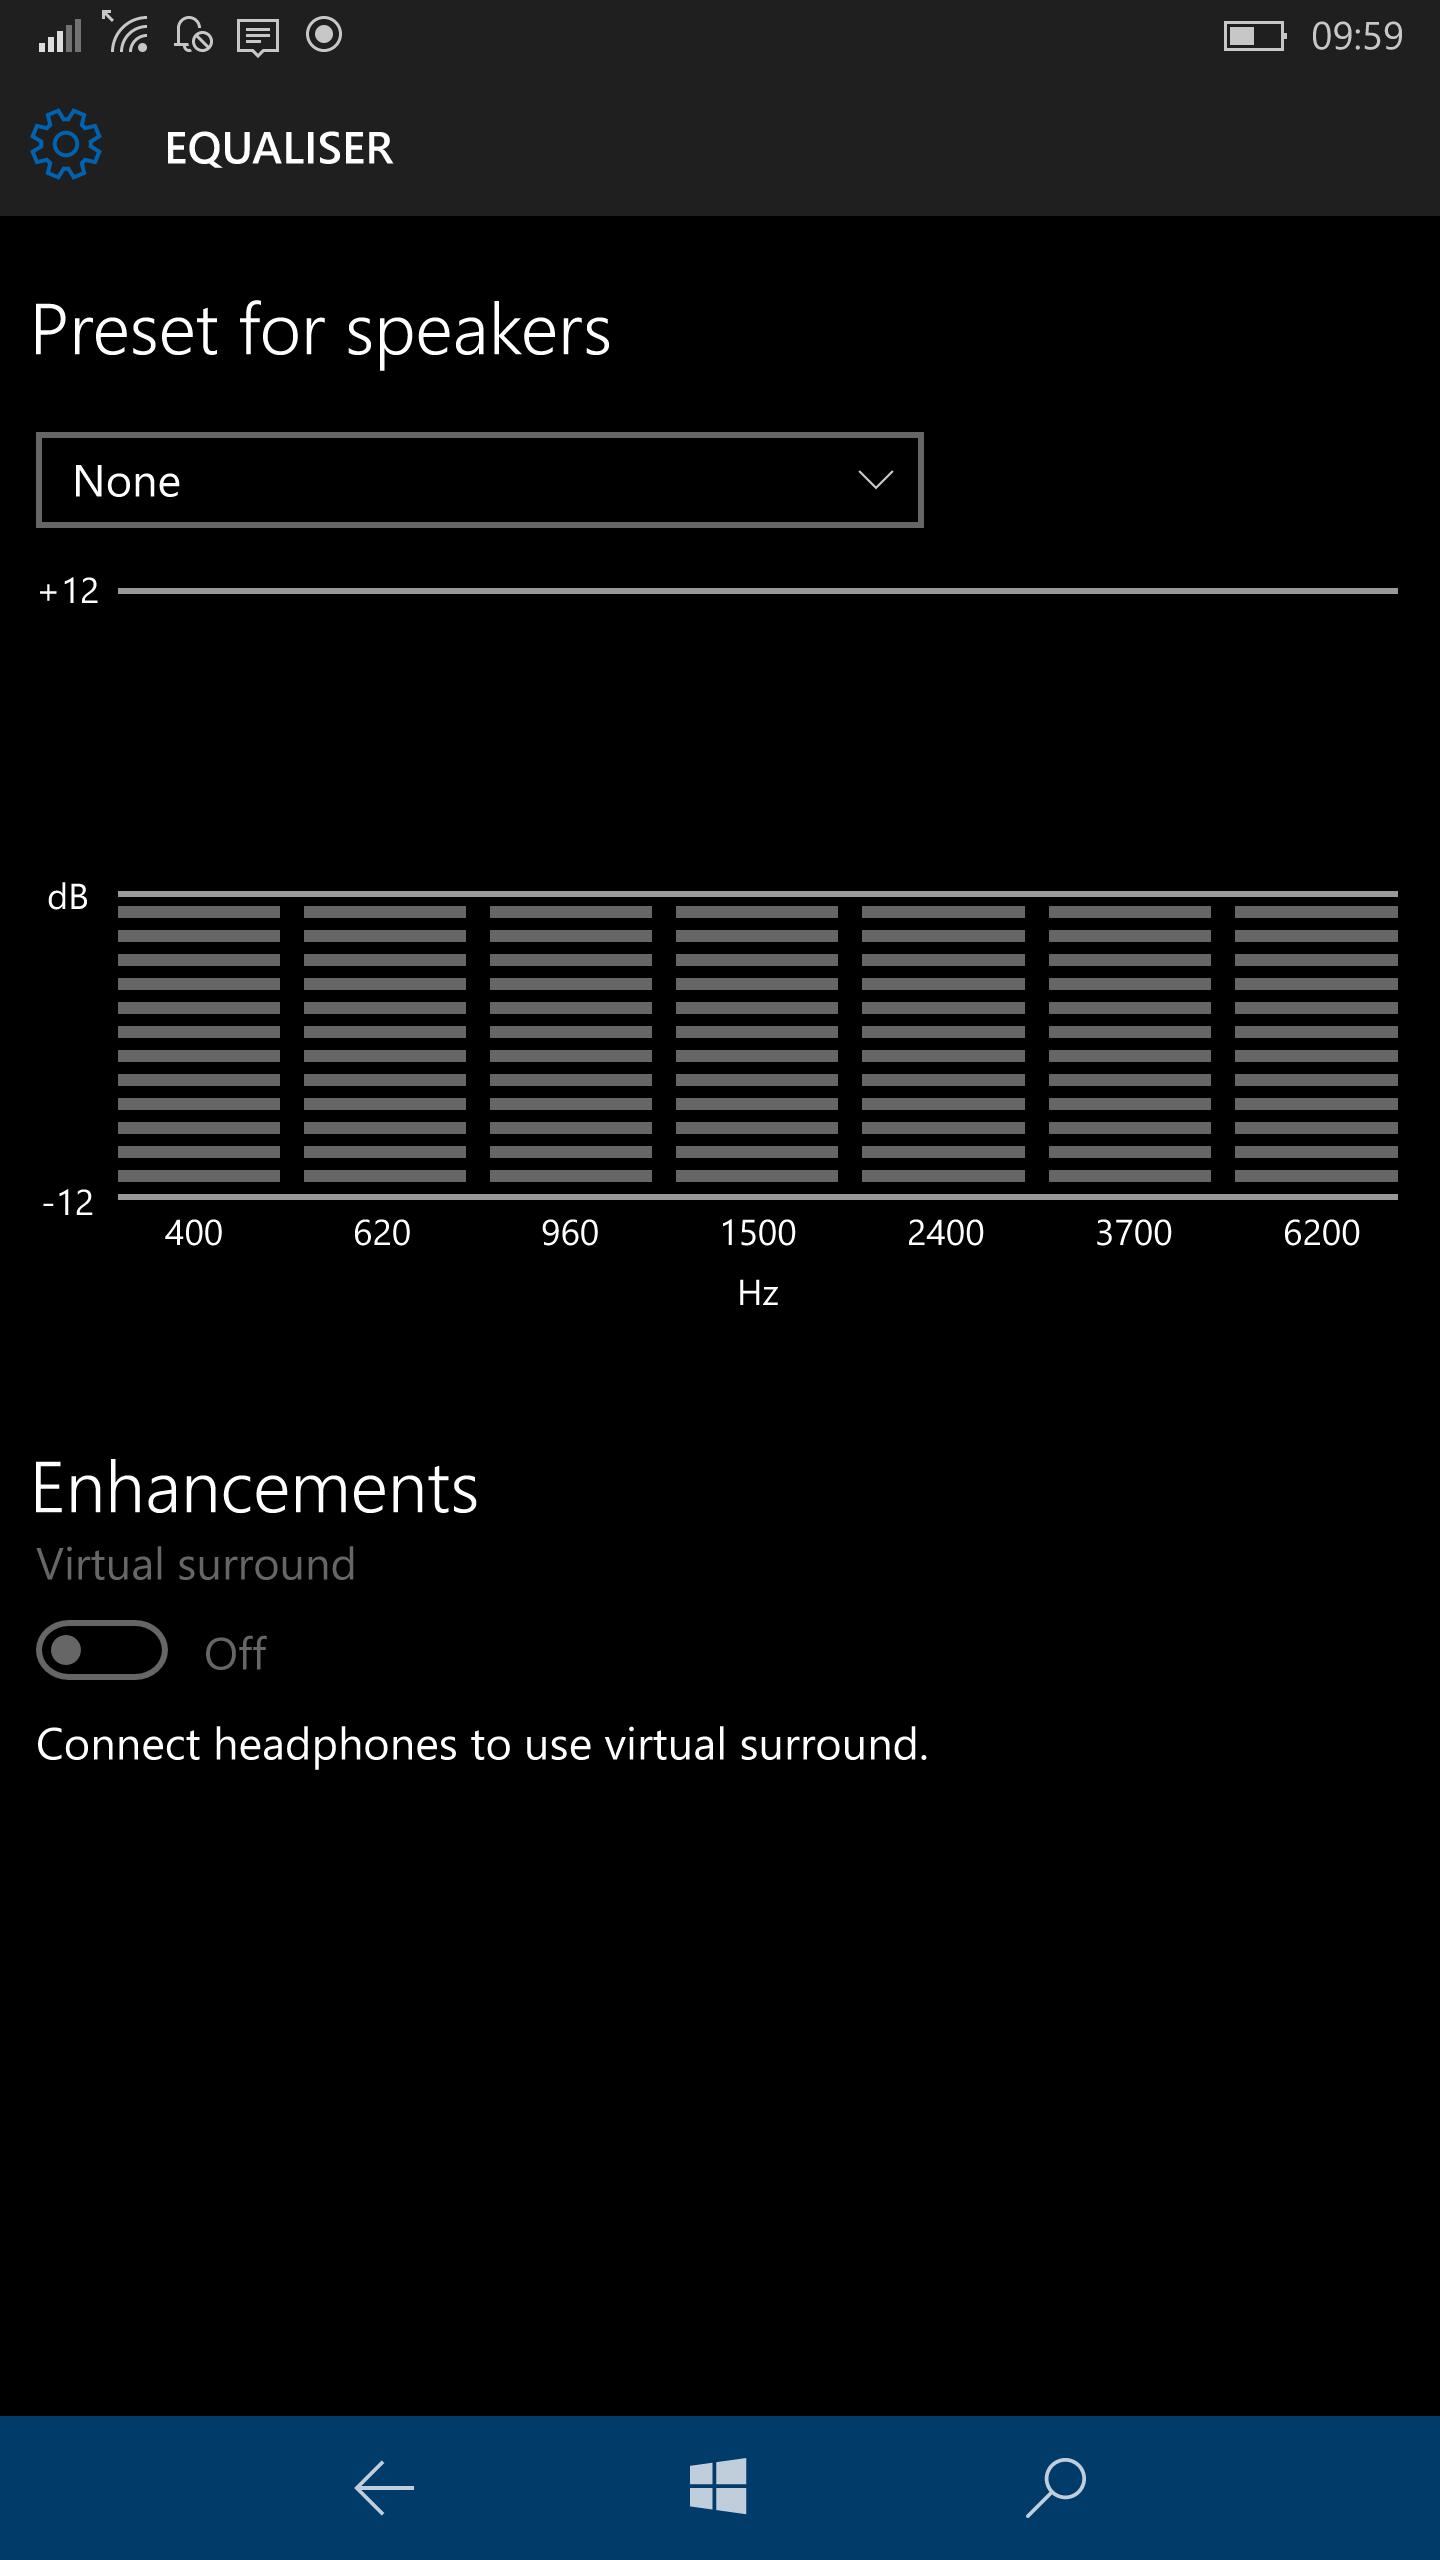 audio for windows 10 mobile gets updated introduces updated user interface for equalizer. Black Bedroom Furniture Sets. Home Design Ideas